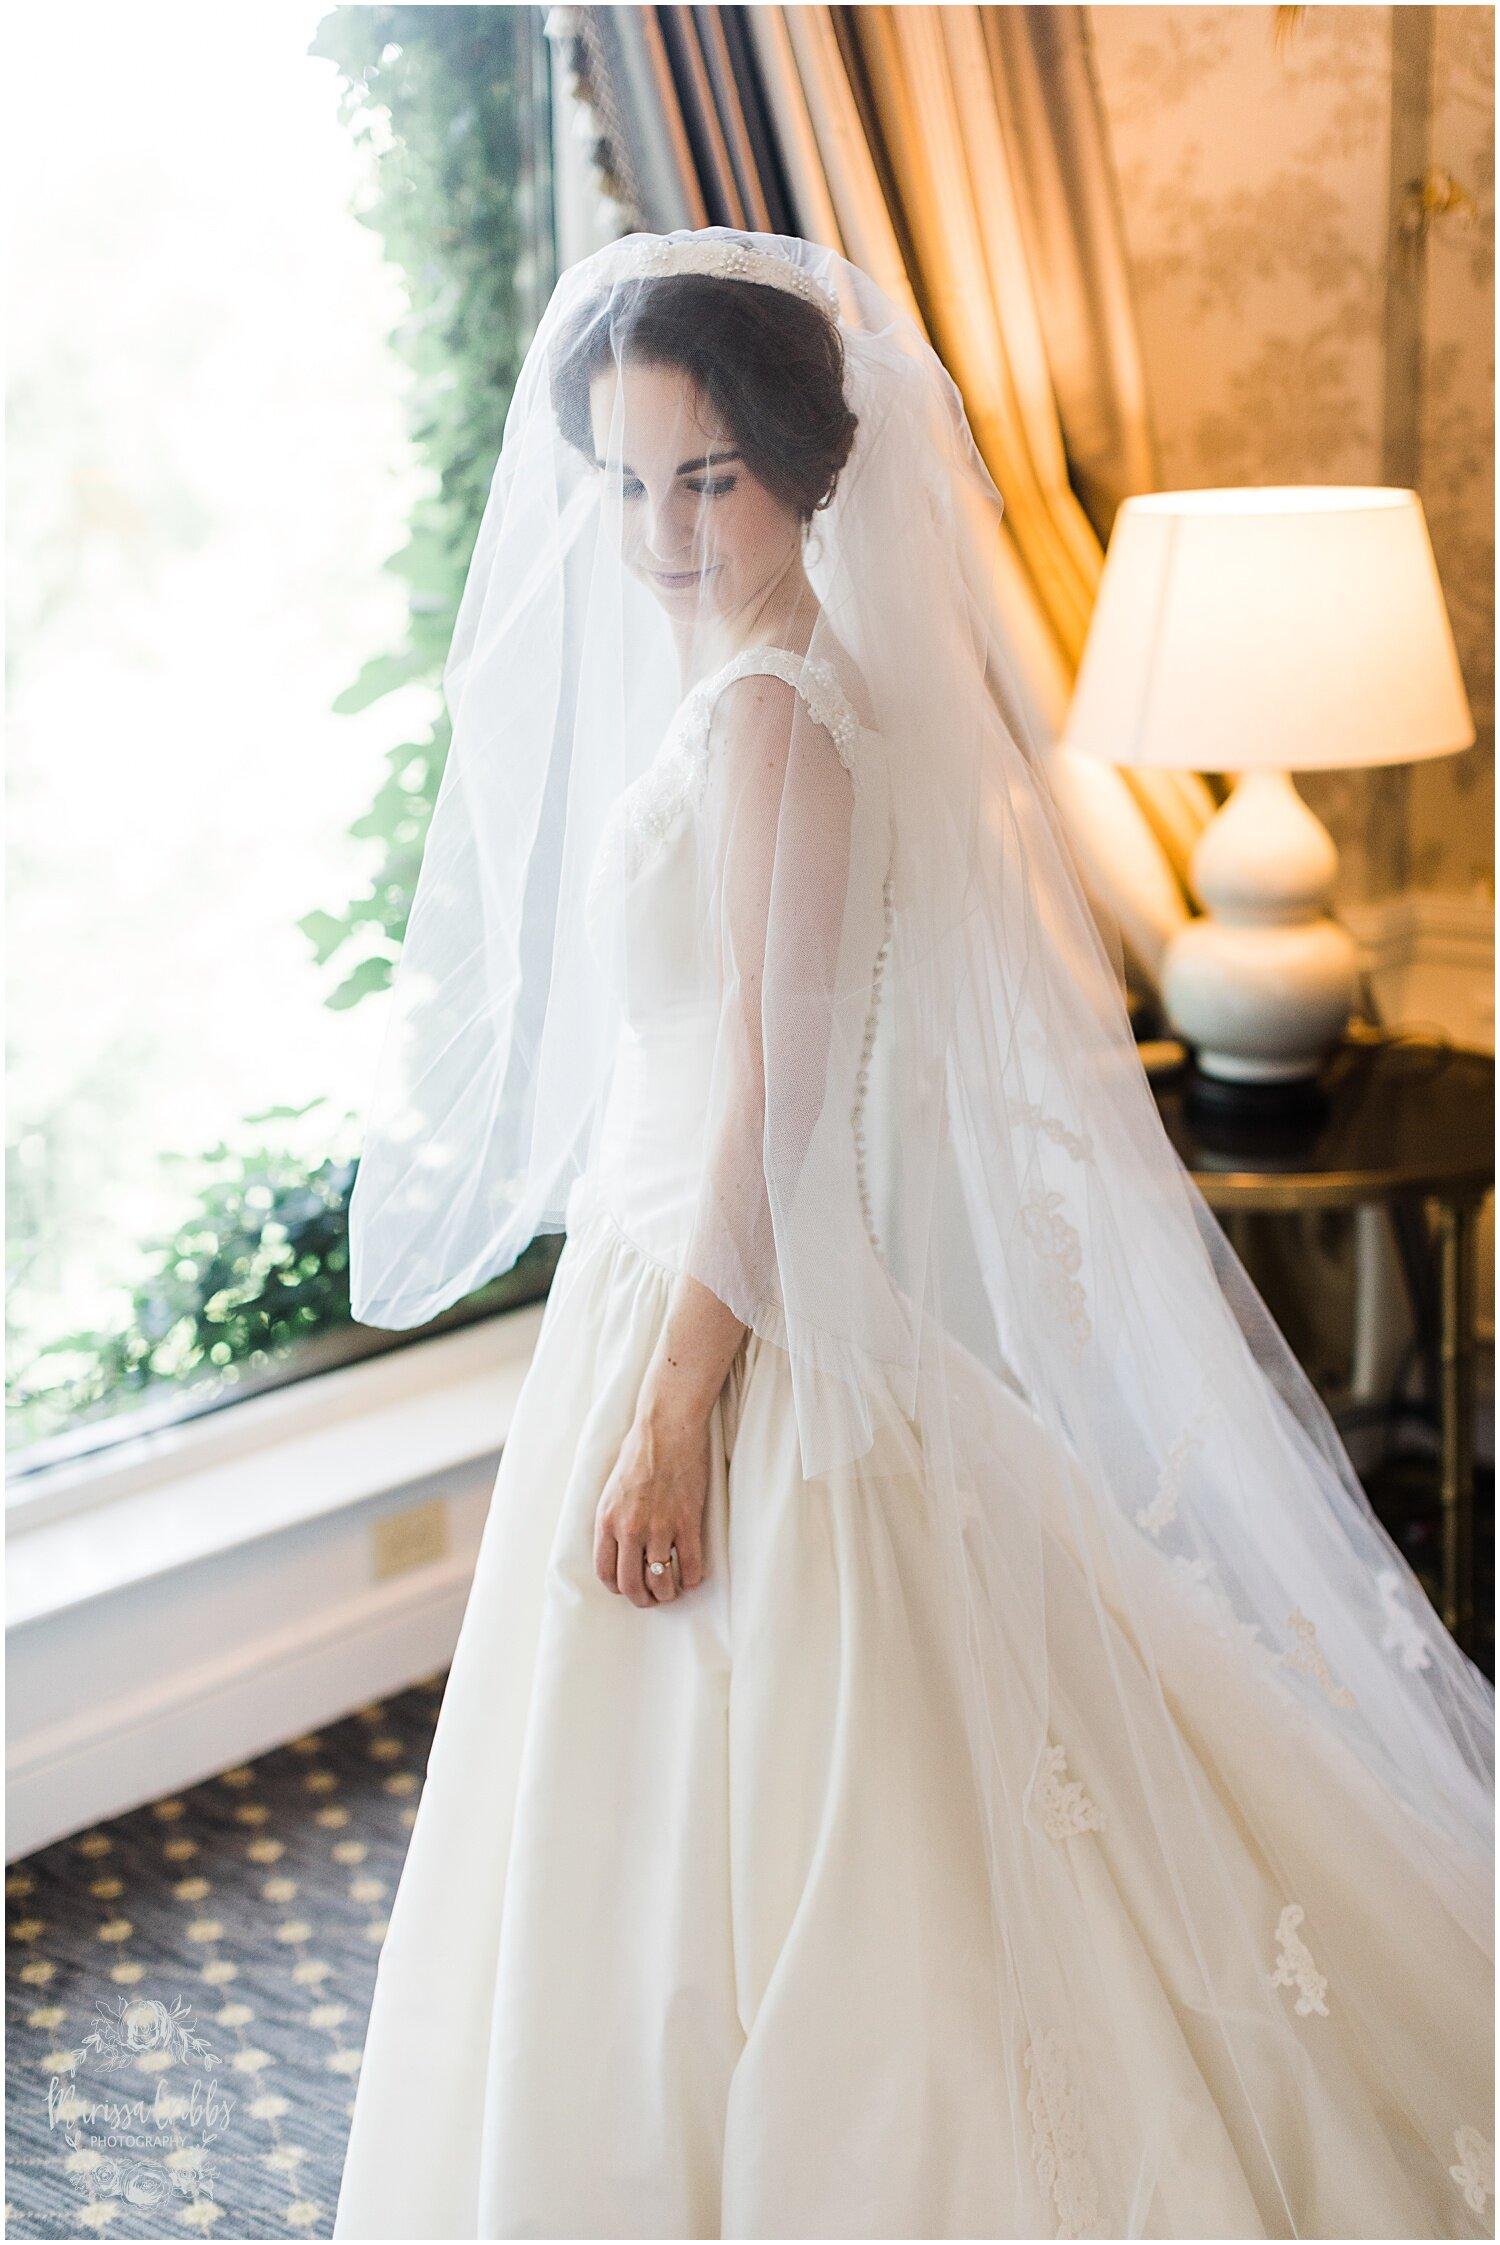 TYLER & CAROLINE MARRIED BLOG | MARISSA CRIBBS PHOTOGRAPHY | THE CARRIAGE CLUB | KANSAS CITY WEDDING PHOTOS_9209.jpg